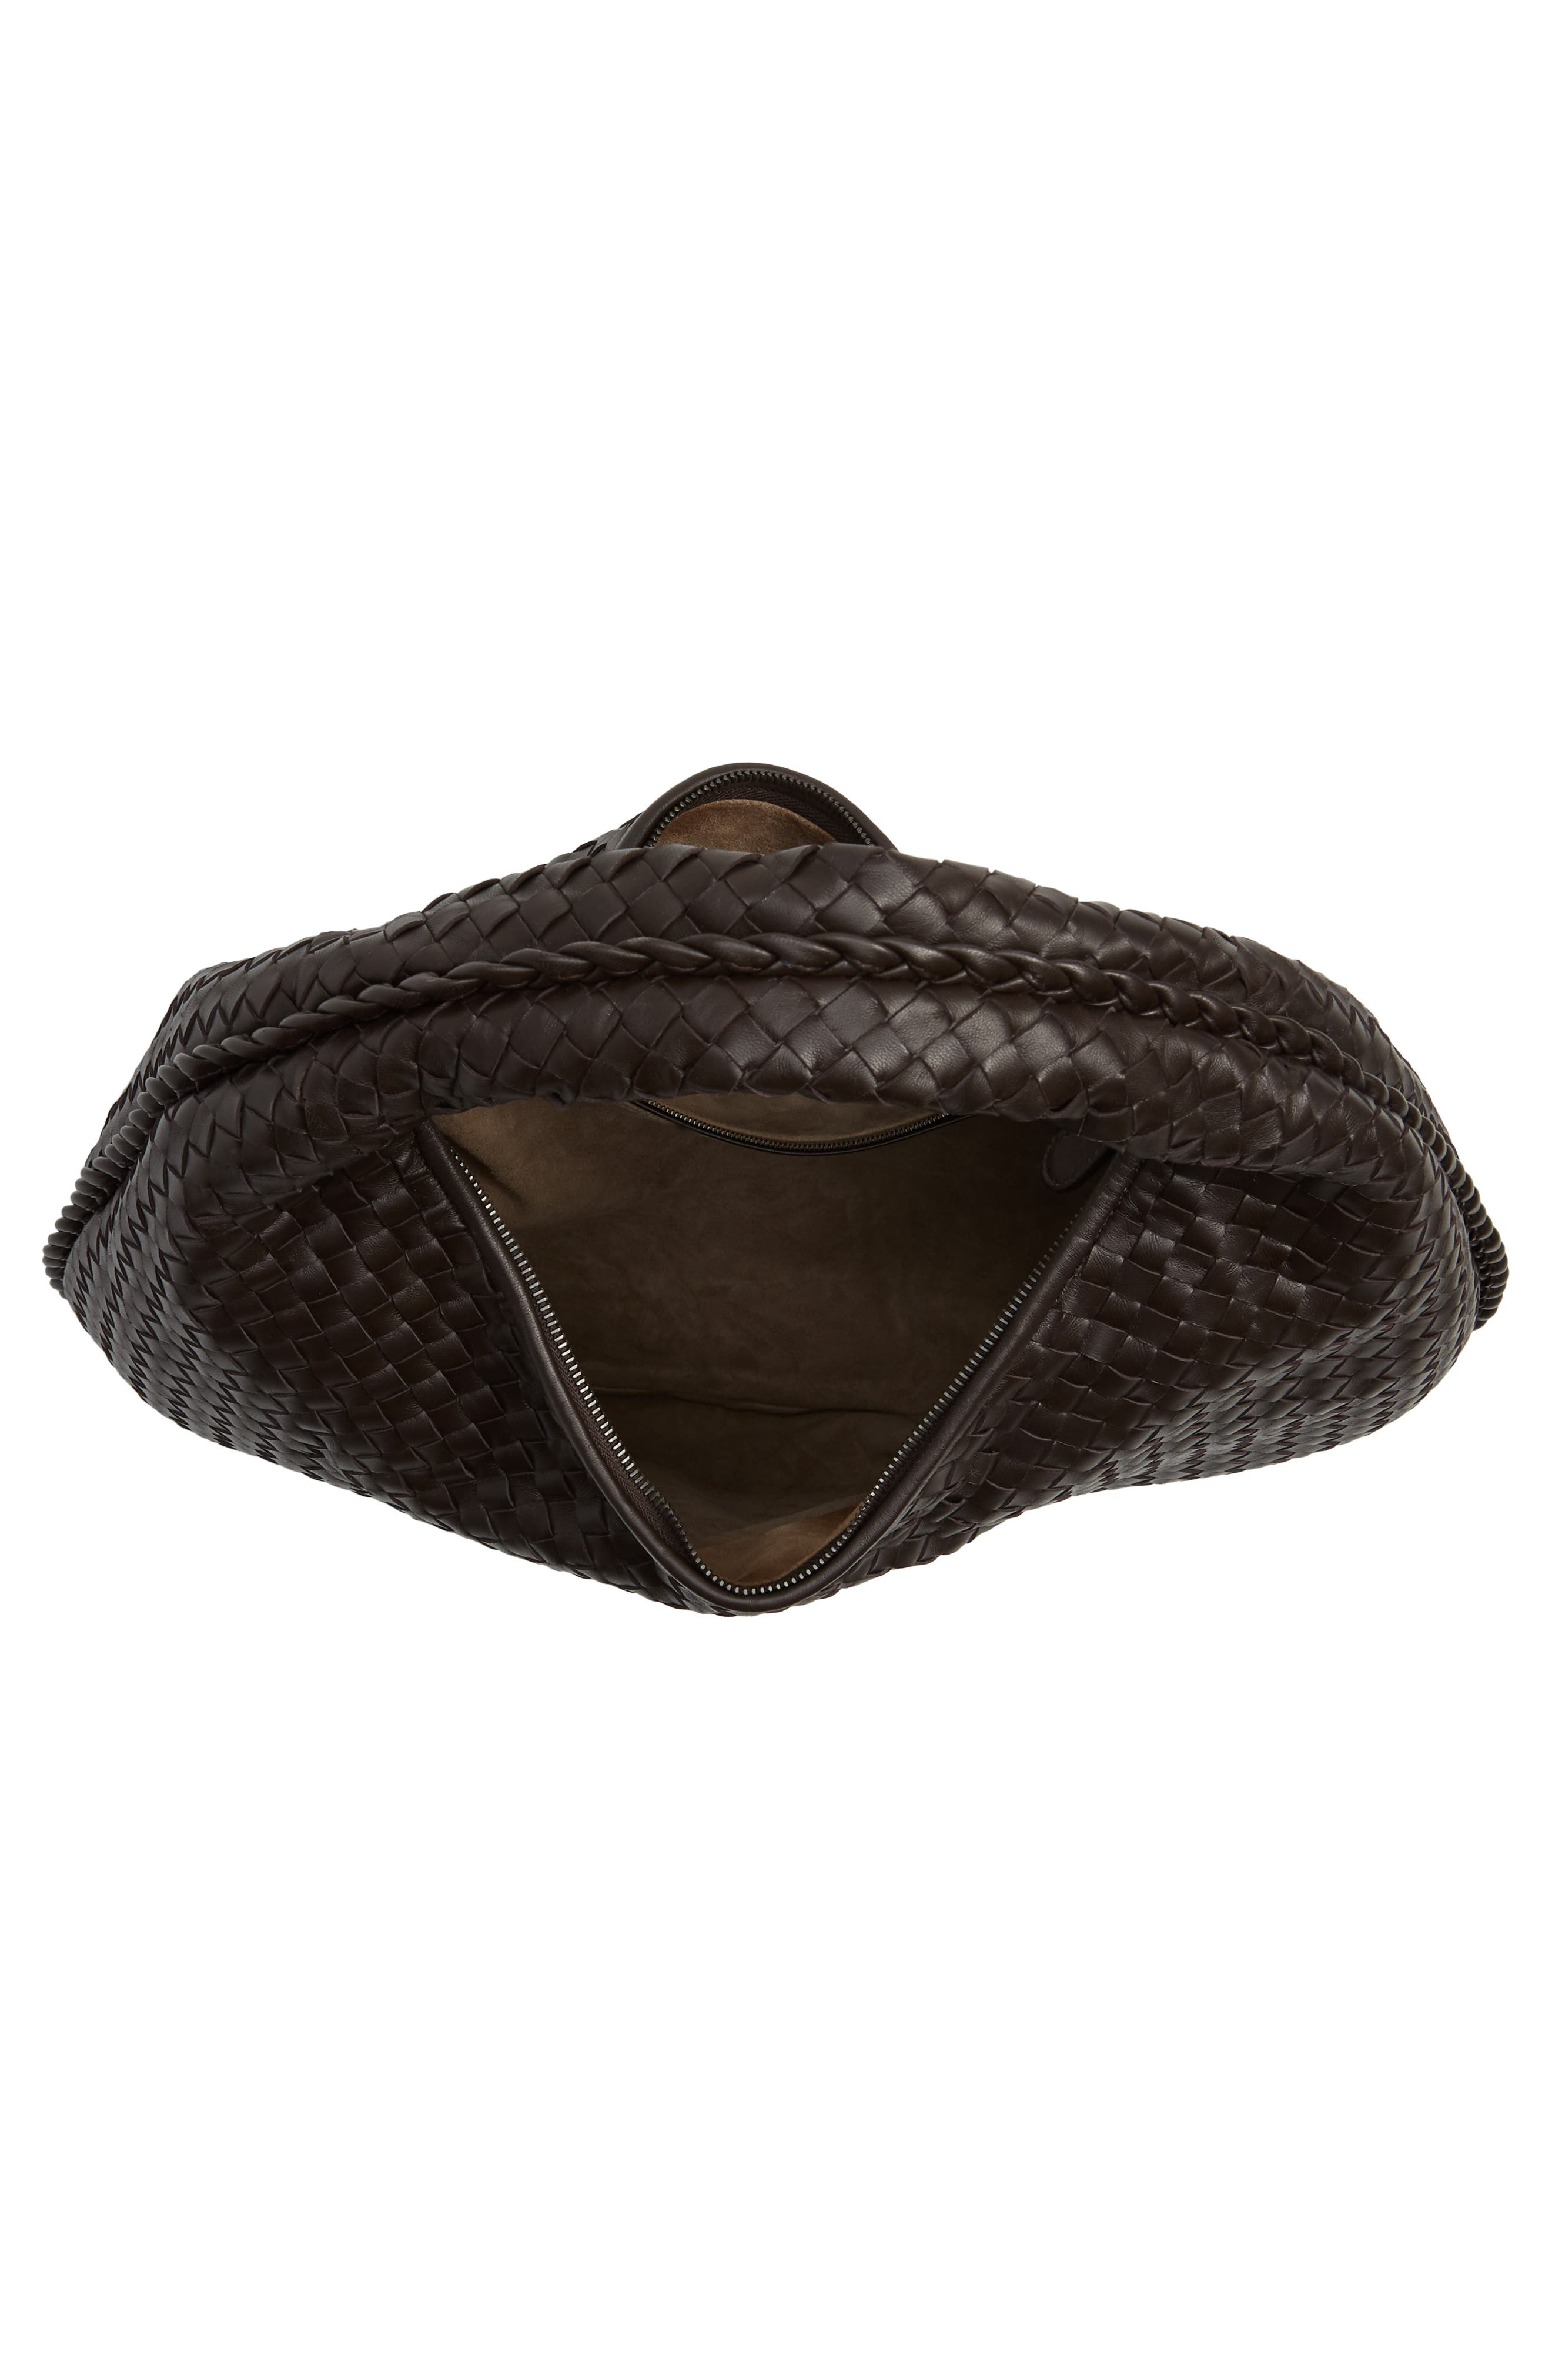 Large Veneta Leather Hobo,                             Alternate thumbnail 4, color,                             2074 Espresso